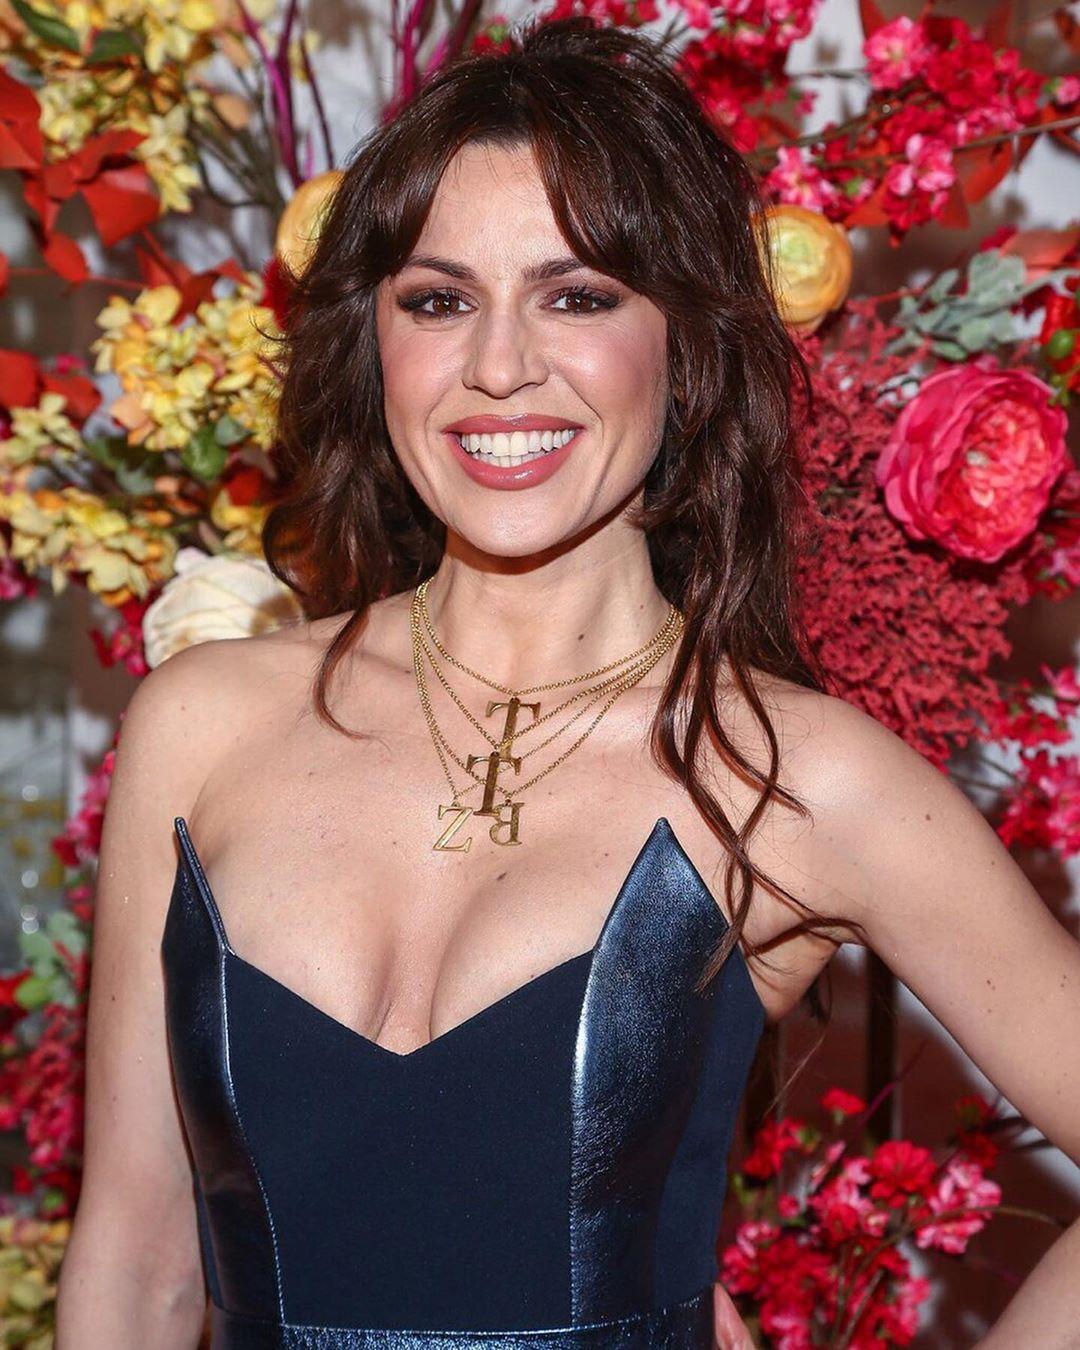 Natalia Avelon German Actress, Singer